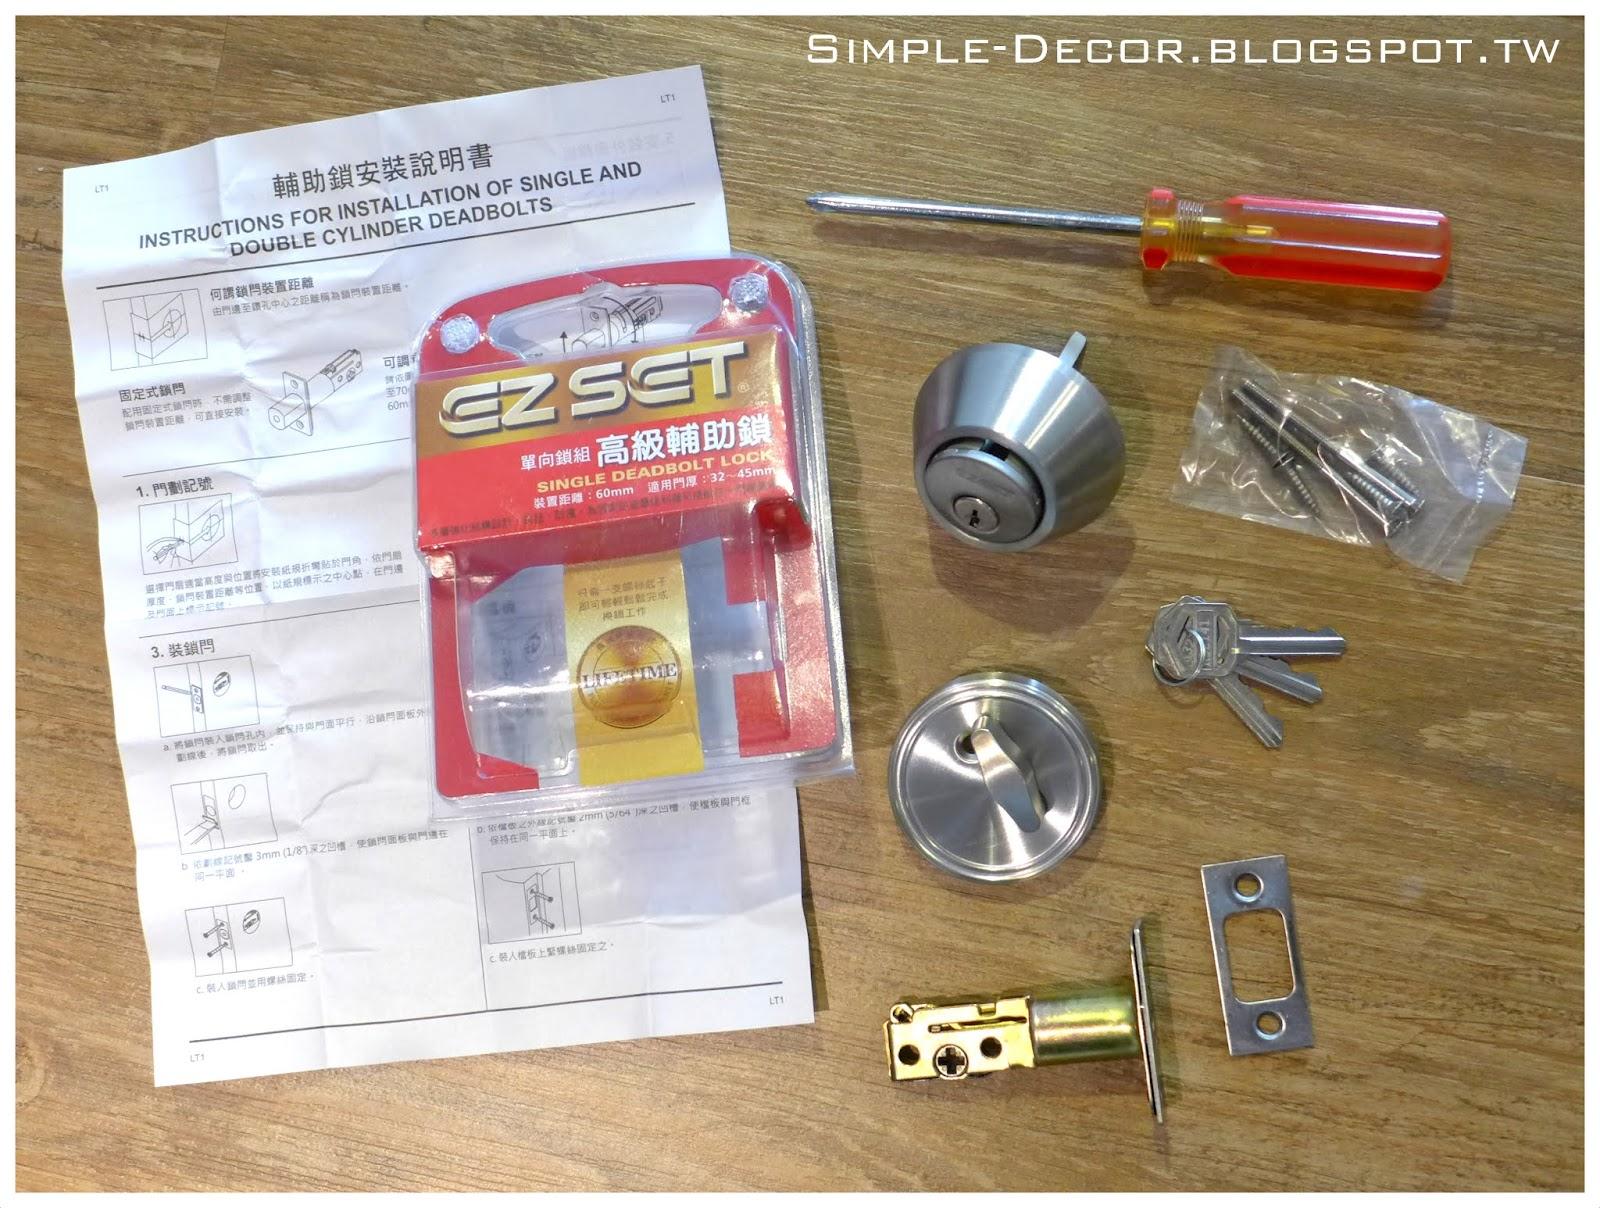 Simple Decor: 居家修繕   門鎖   第一次換鎖就上手。大門輔助鎖的拆裝與更換